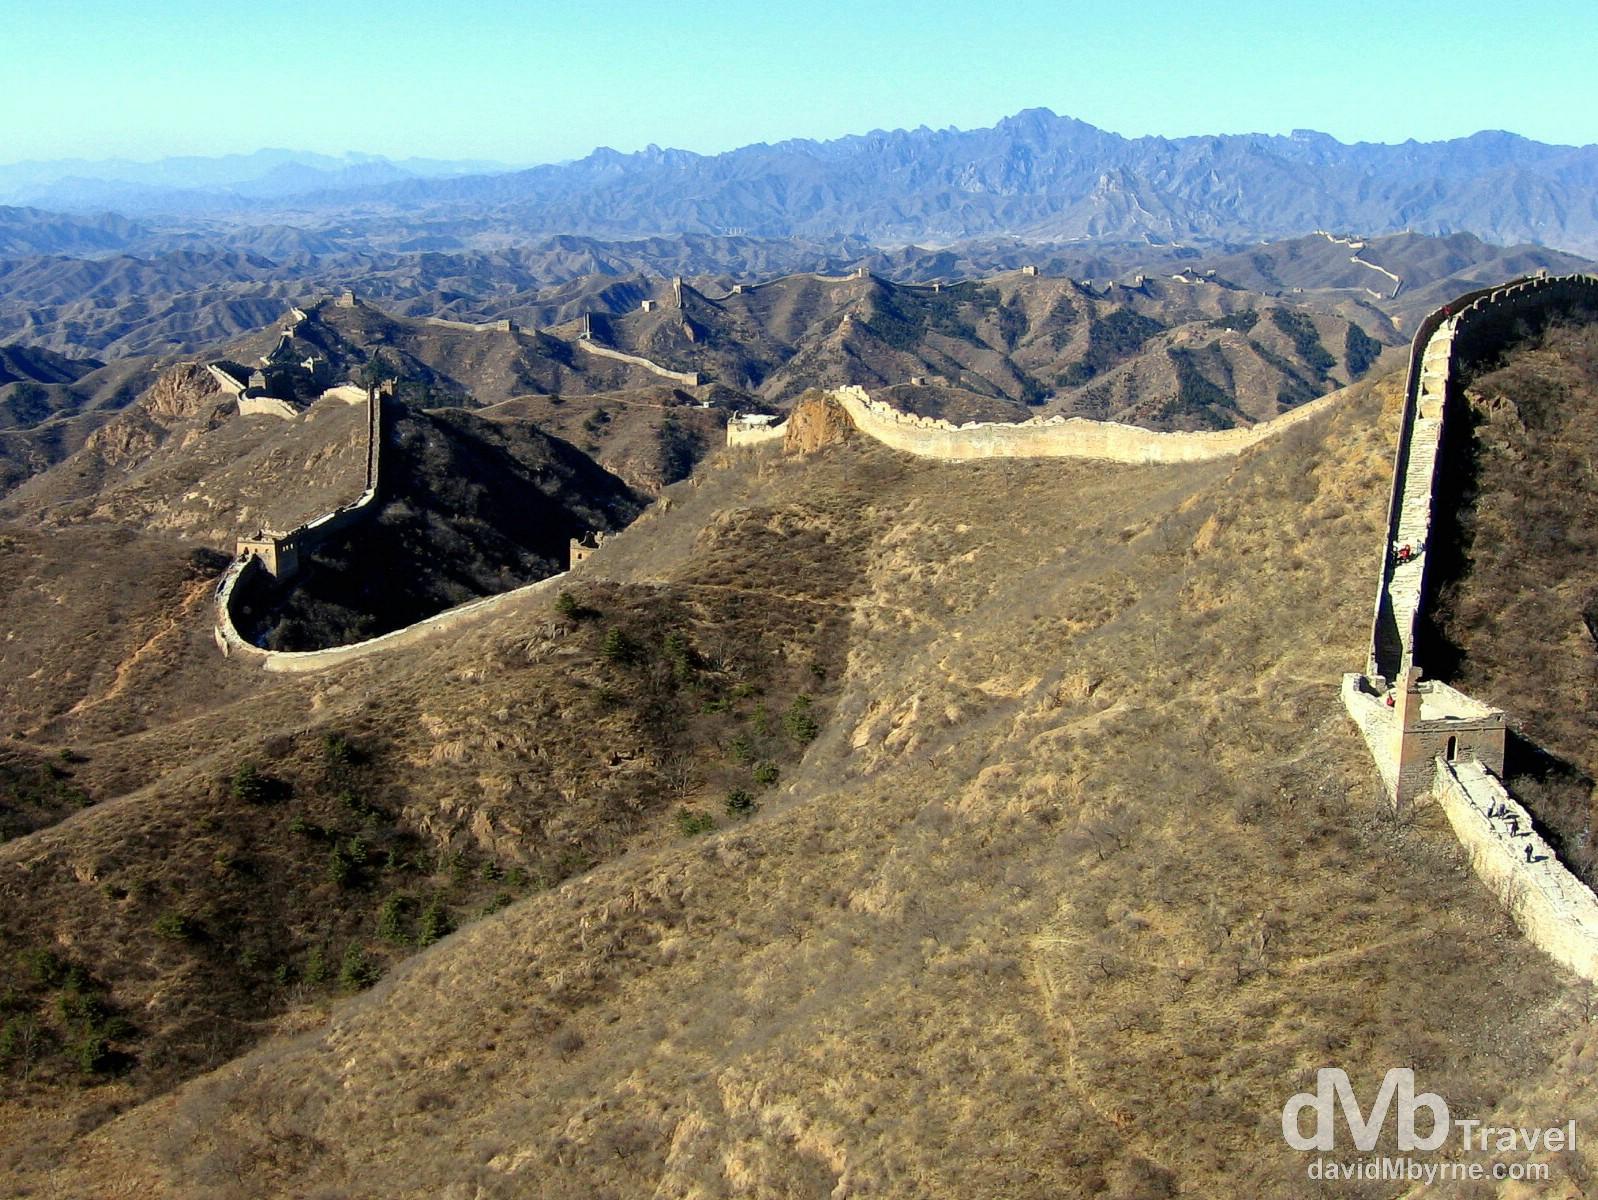 A section of The Great Wall at Jinshanling, China. February 17th, 2008.